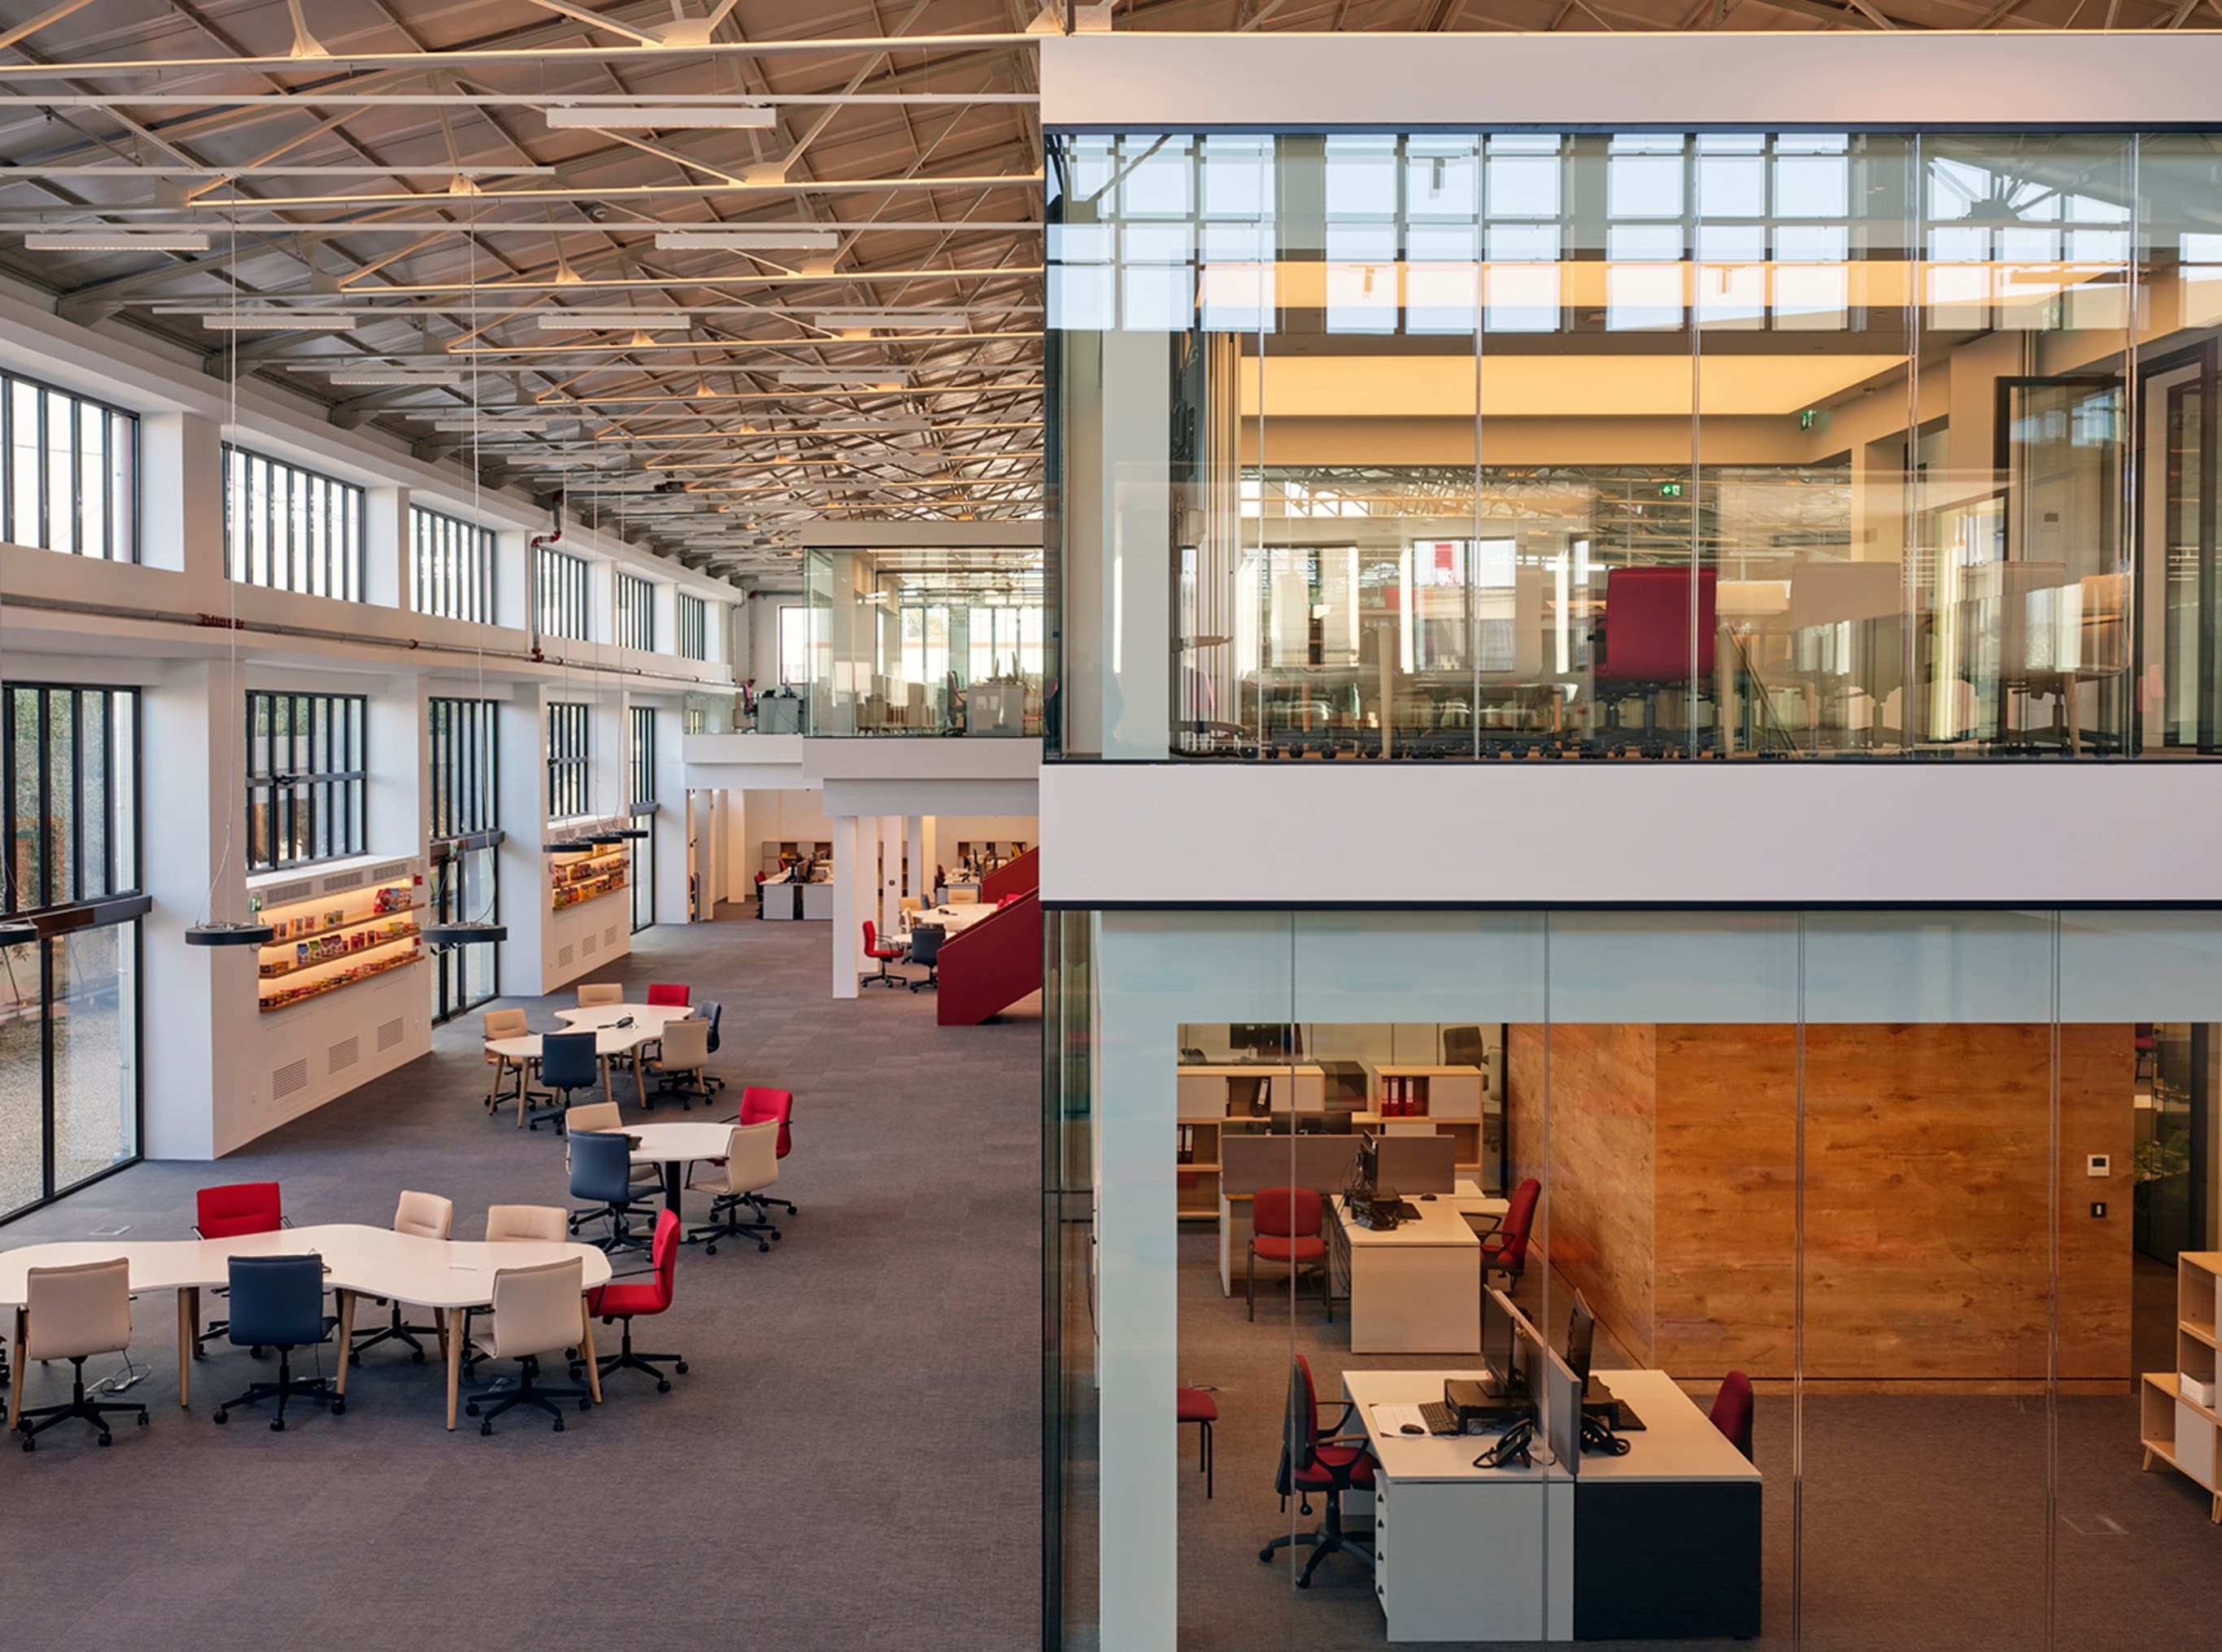 Featured image for Ένα σύγχρονο εργασιακό περιβάλλον